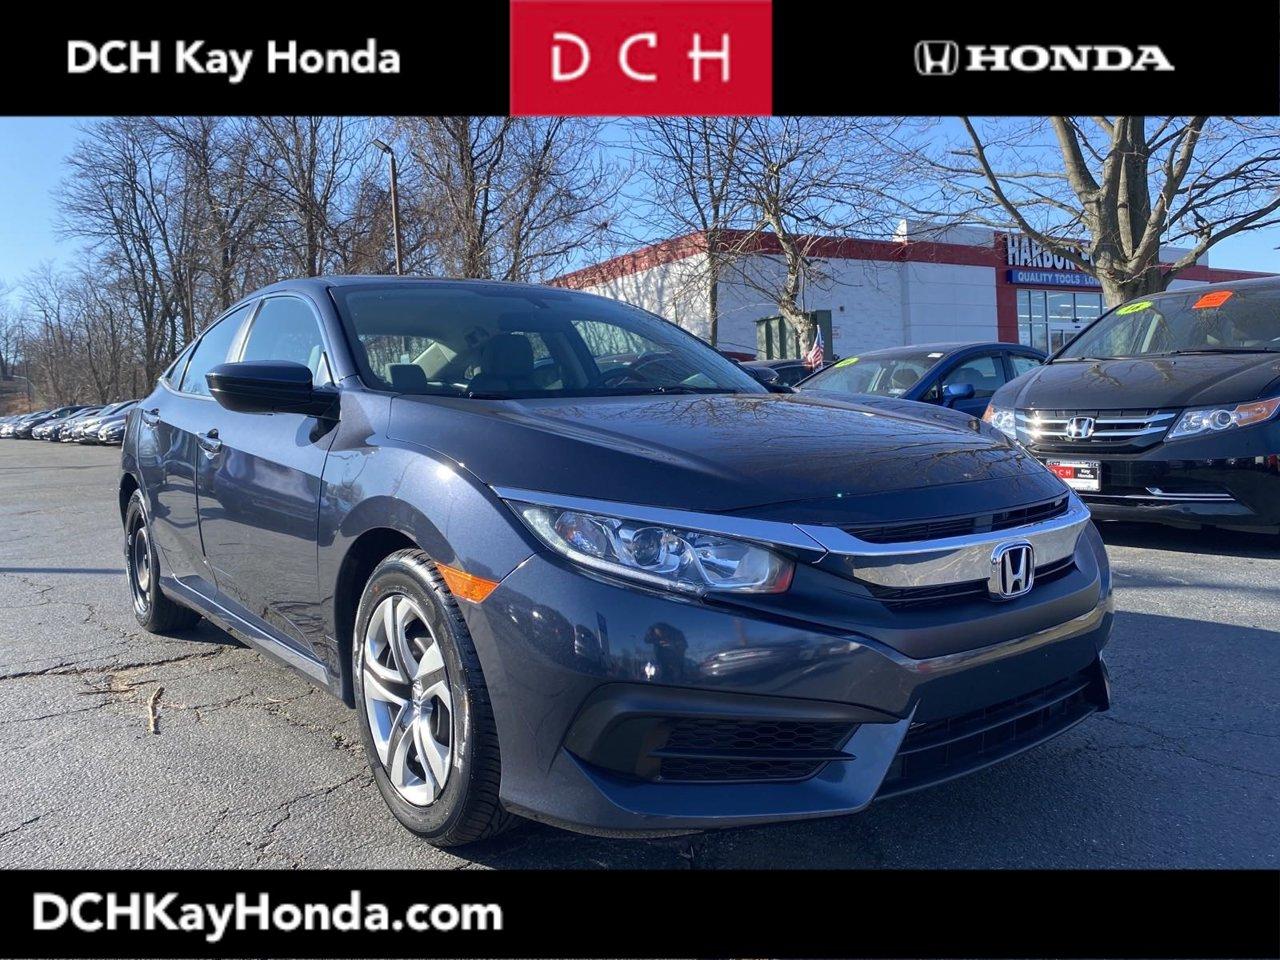 Used 2018 Honda Civic Sedan in Eatontown, NJ